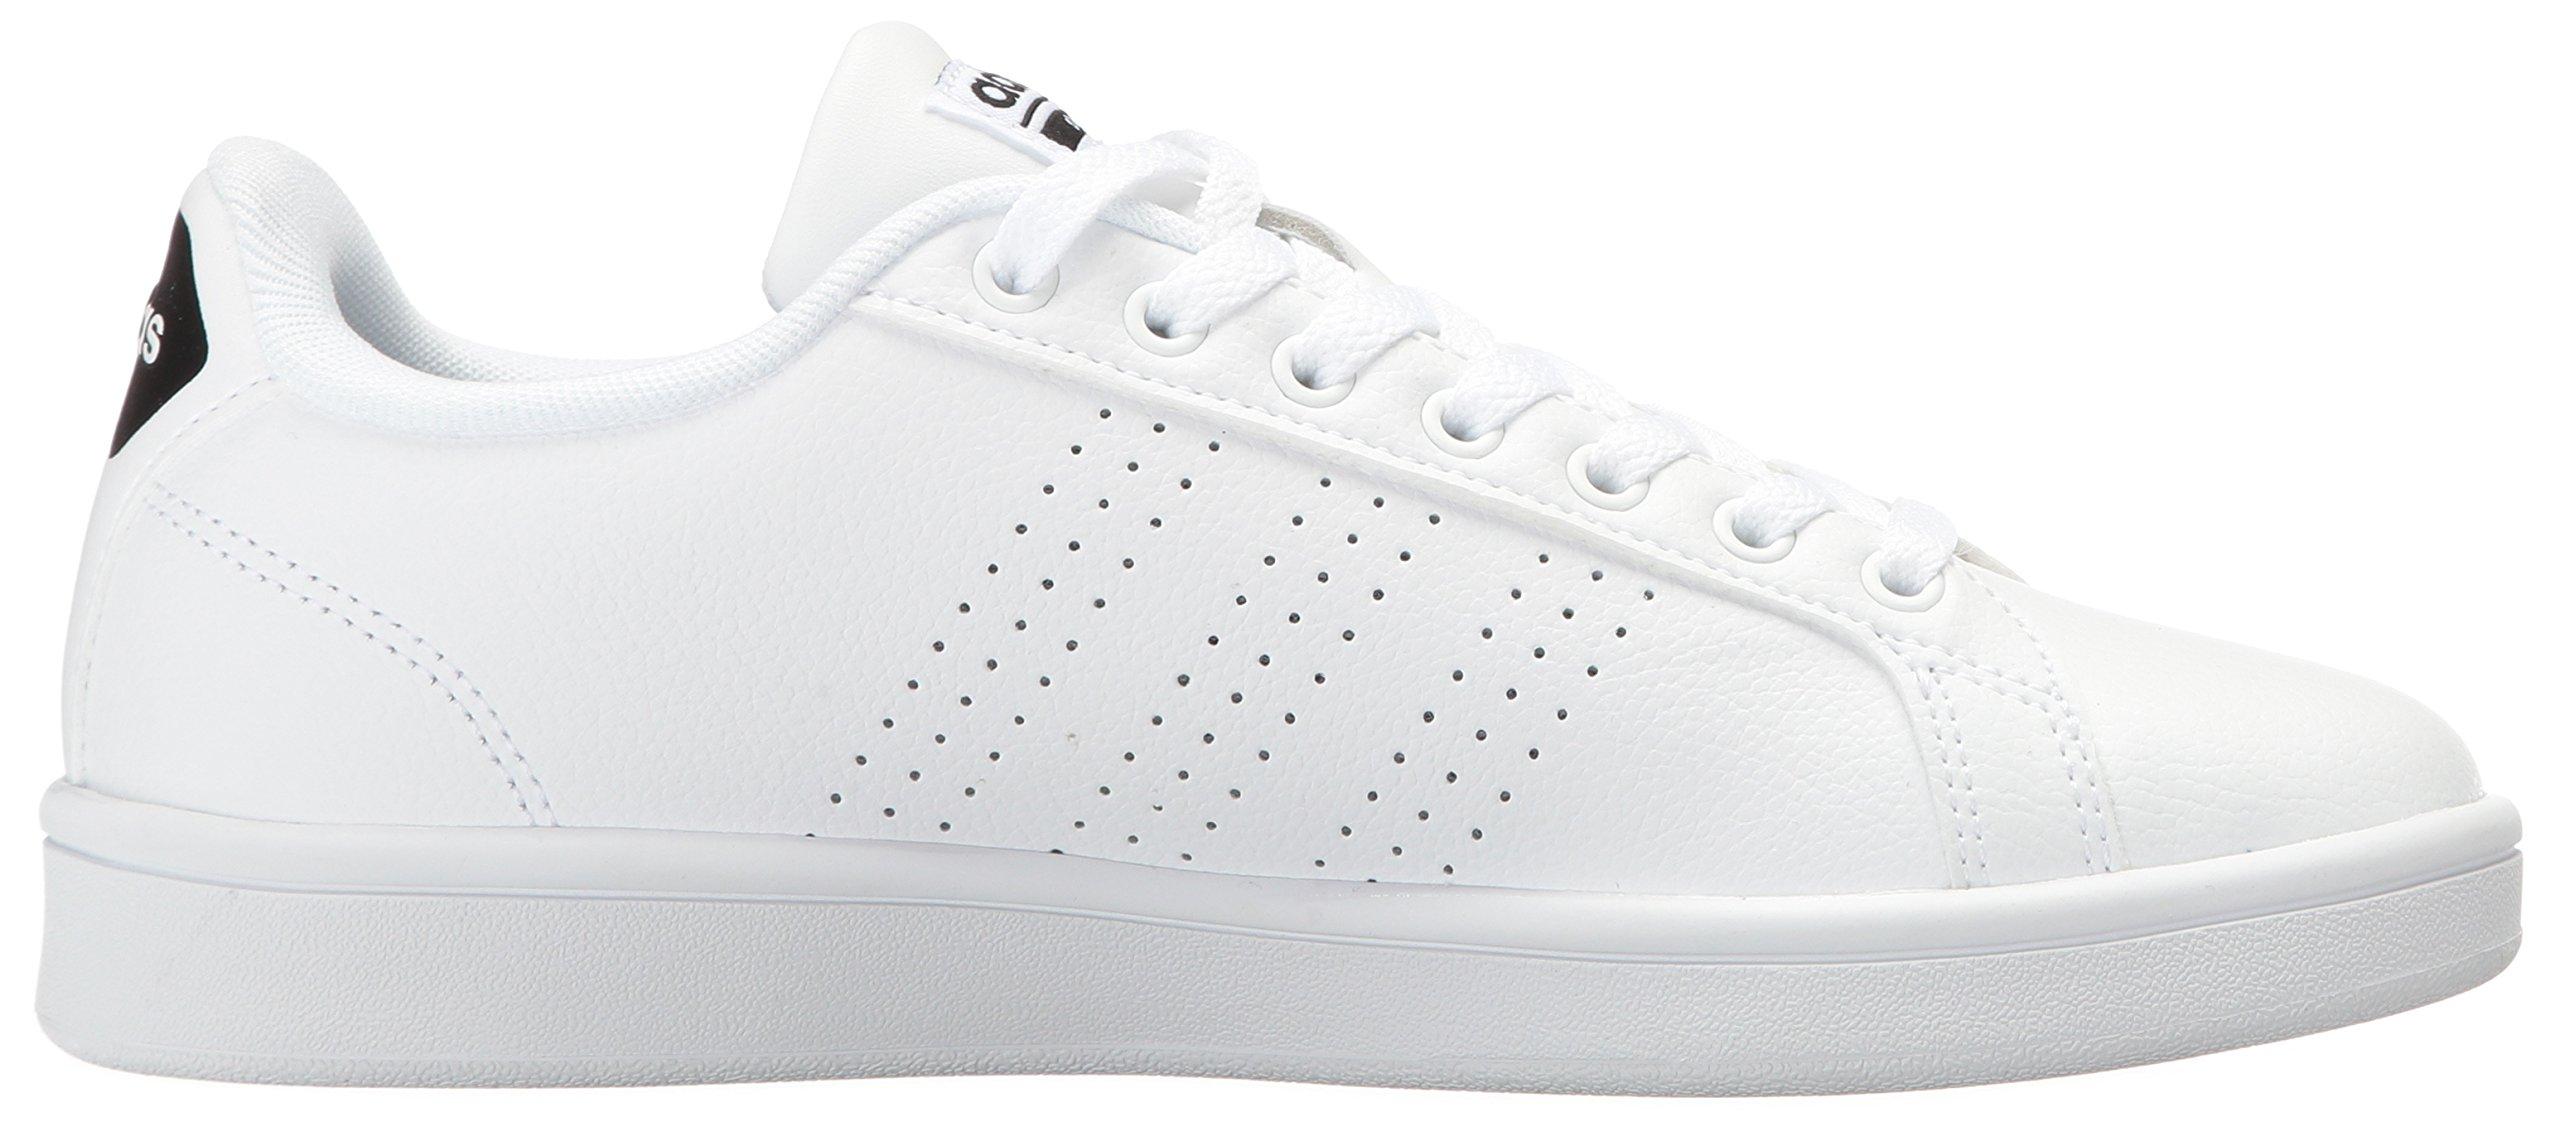 adidas Women's Shoes Cloudfoam Advantage Clean Sneakers, White/White/Black, (7.5 M US) by adidas (Image #7)